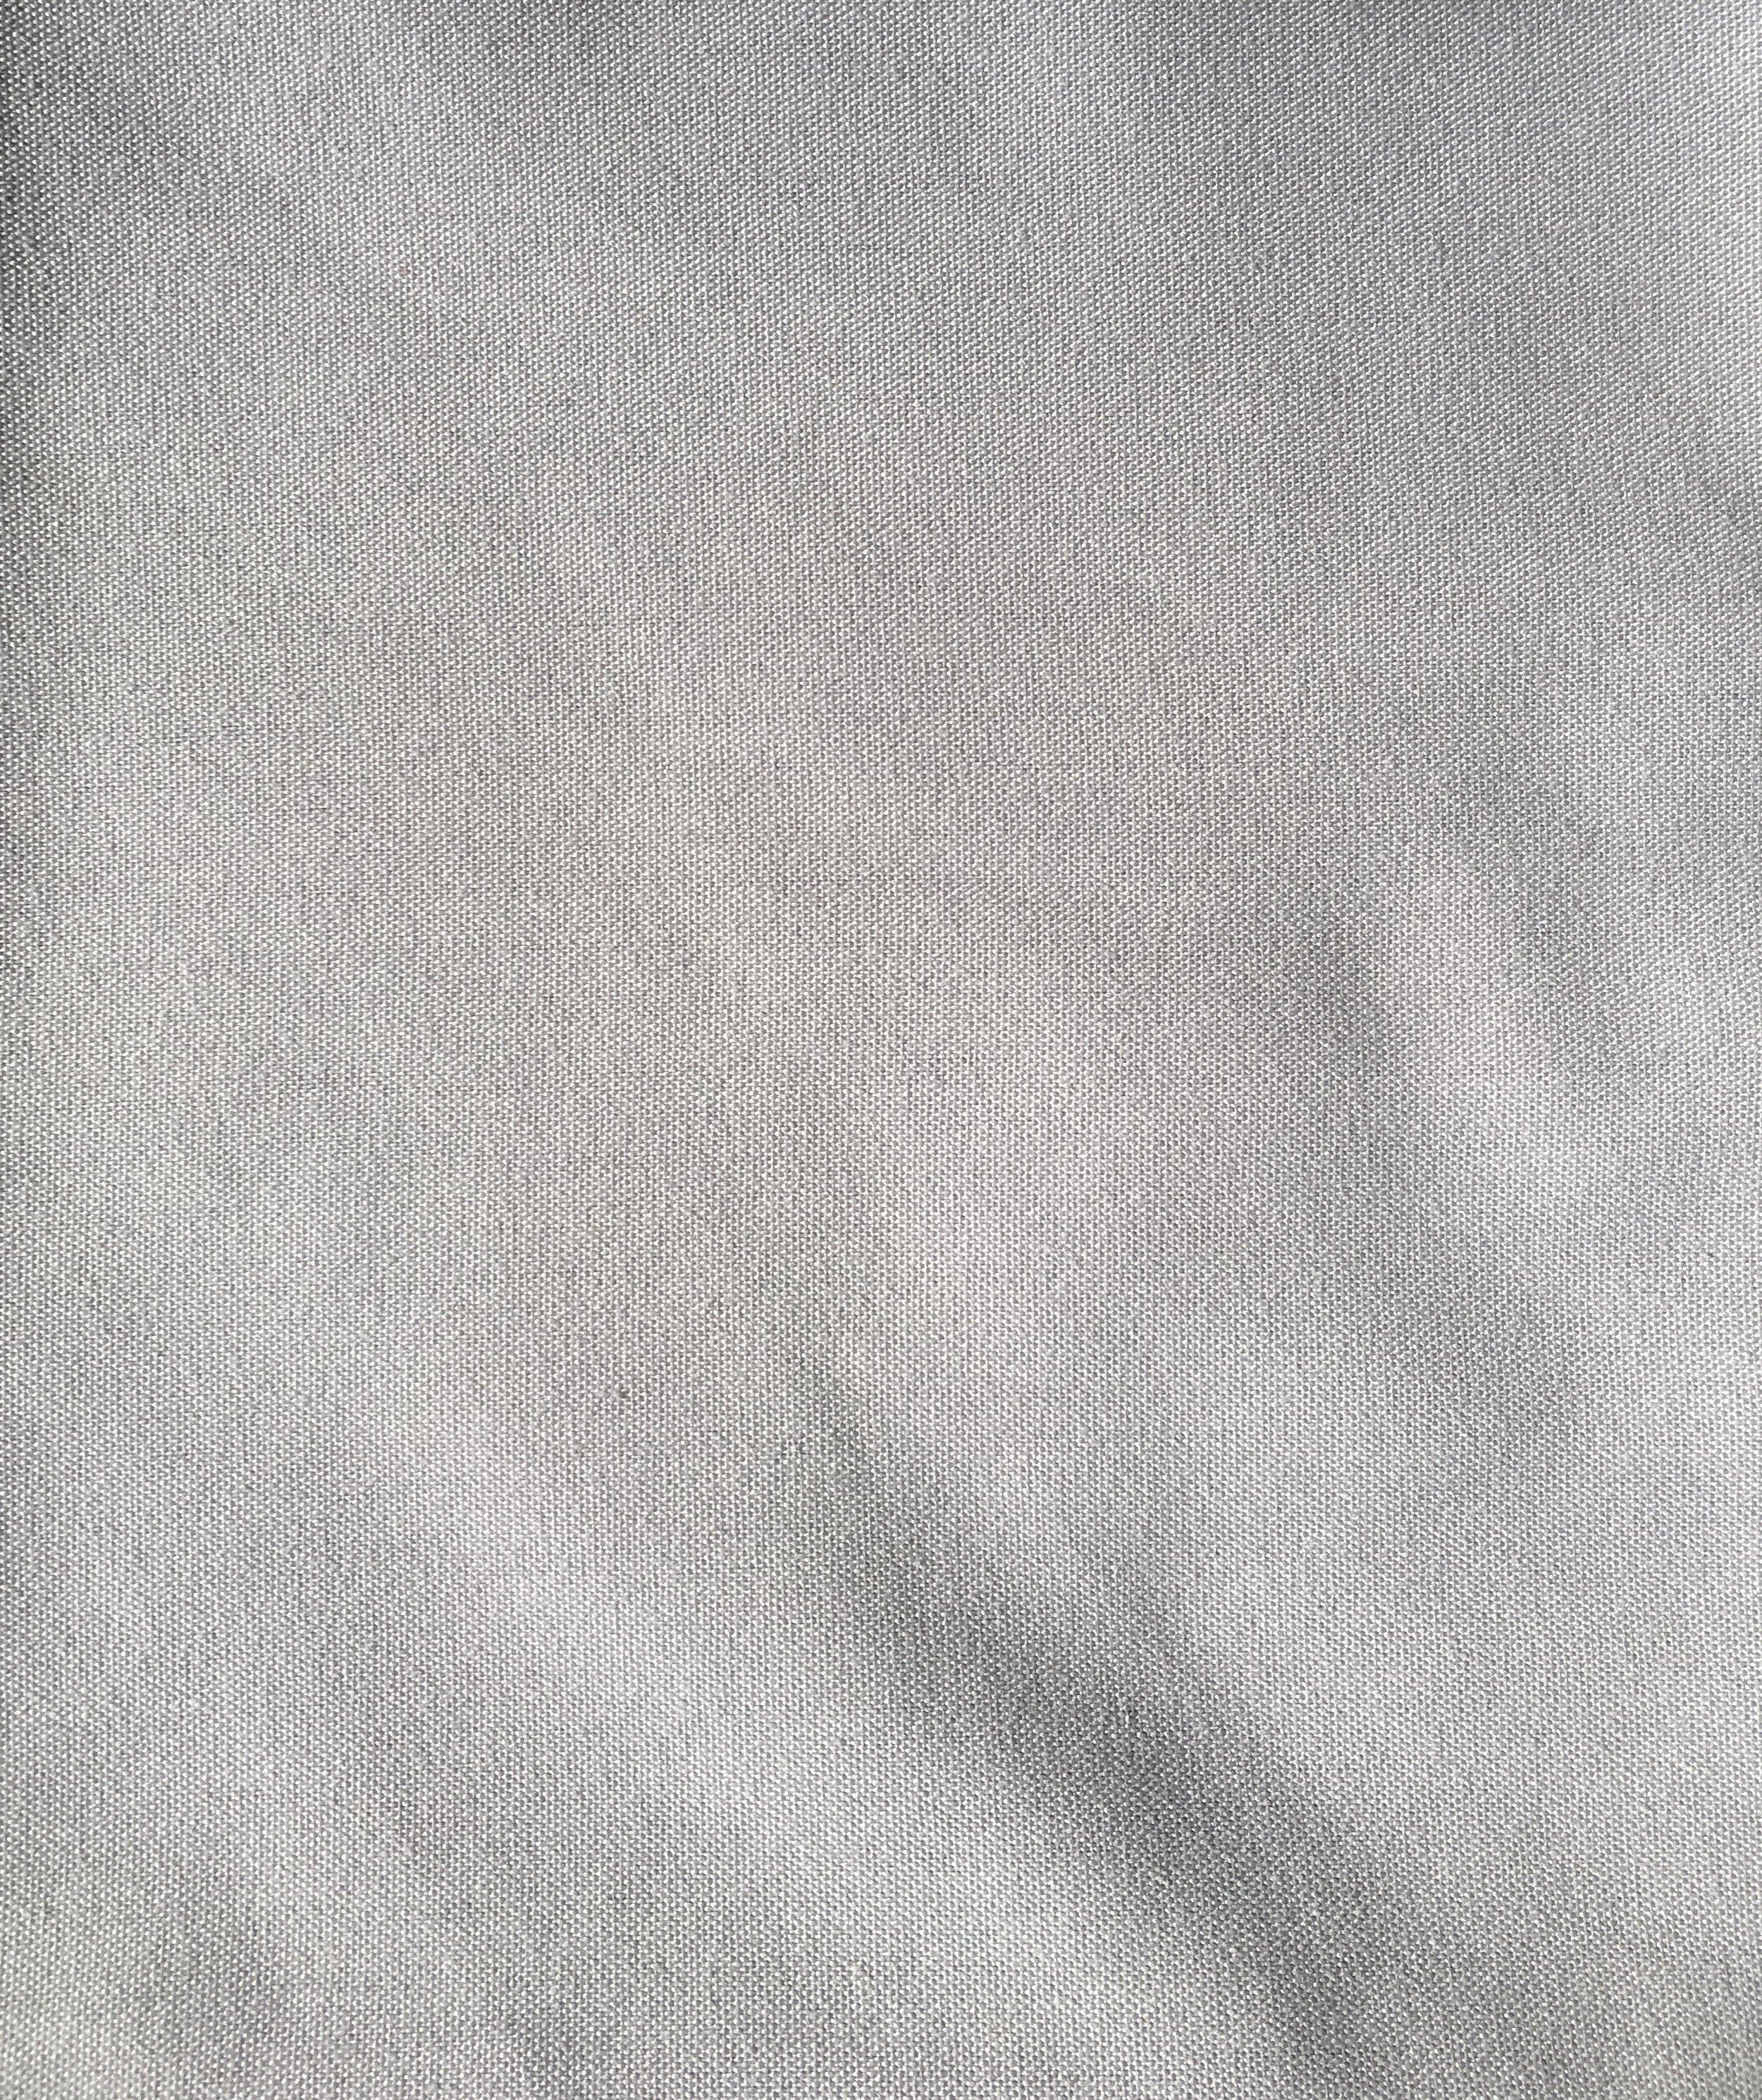 Soft Grey Napkin (Crisp)  50 cm x 50 cm  $1.80 each